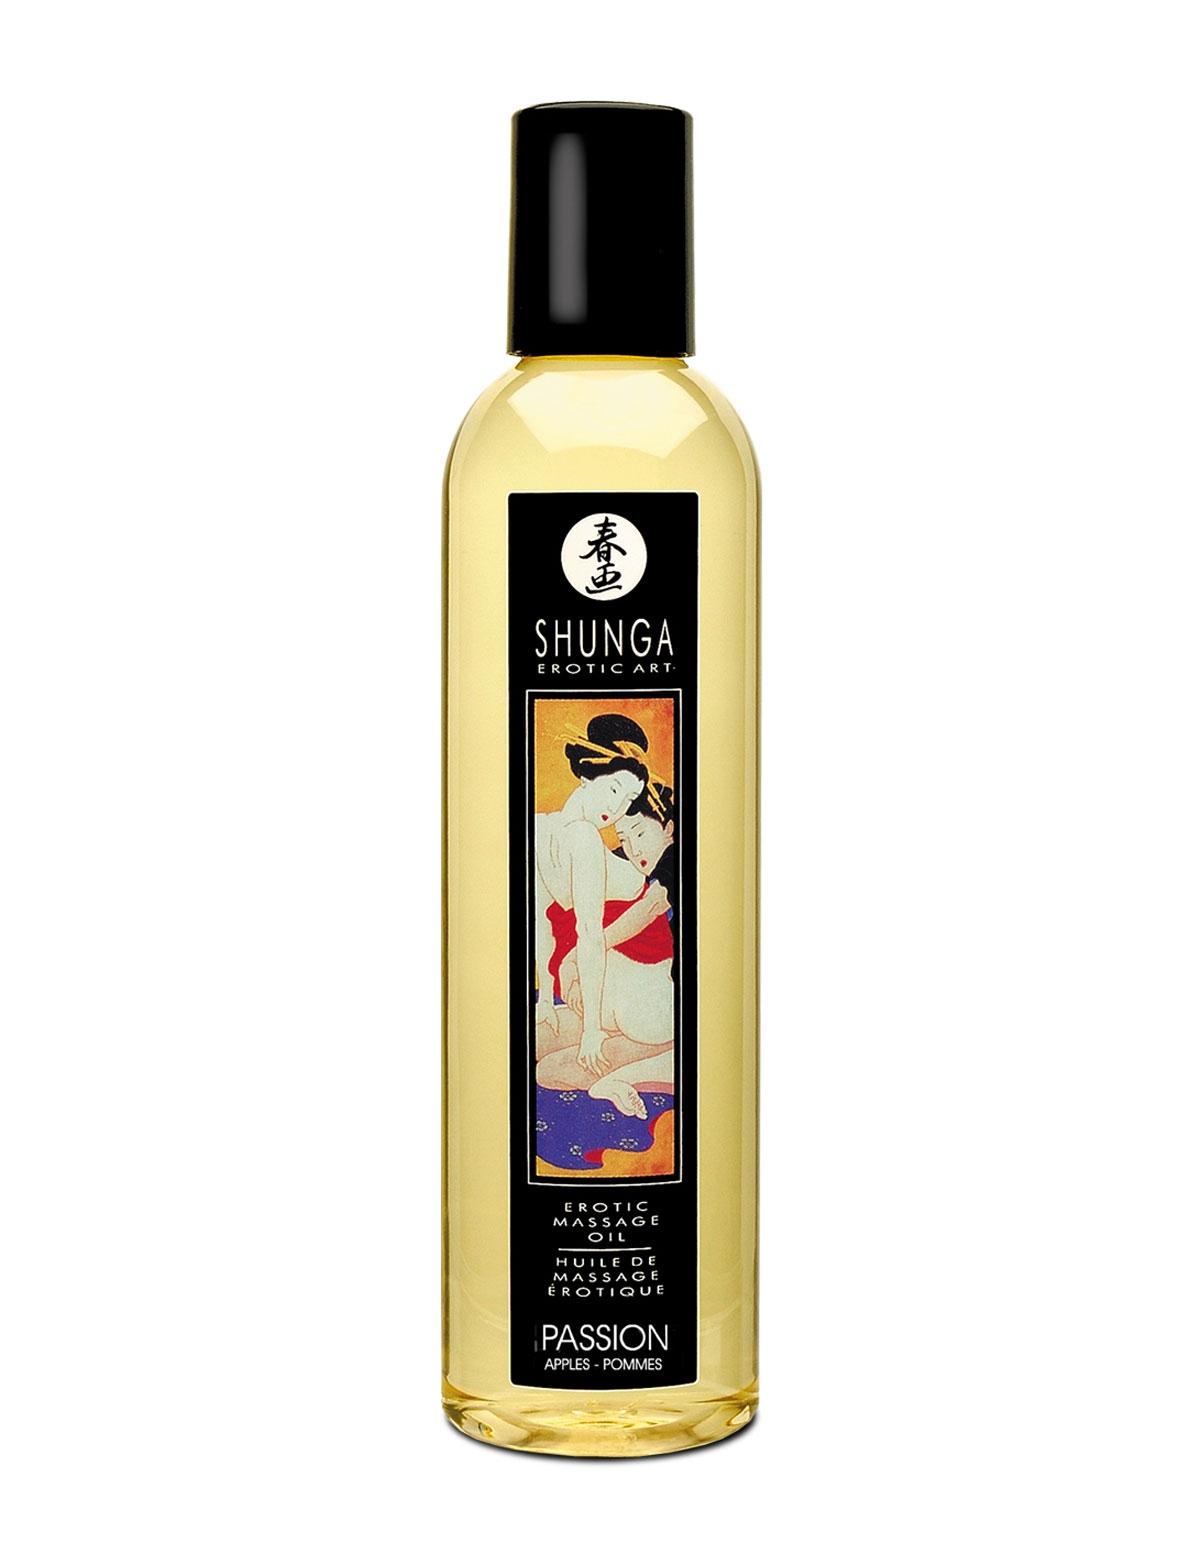 Erotic Massage Oil Passion Apples